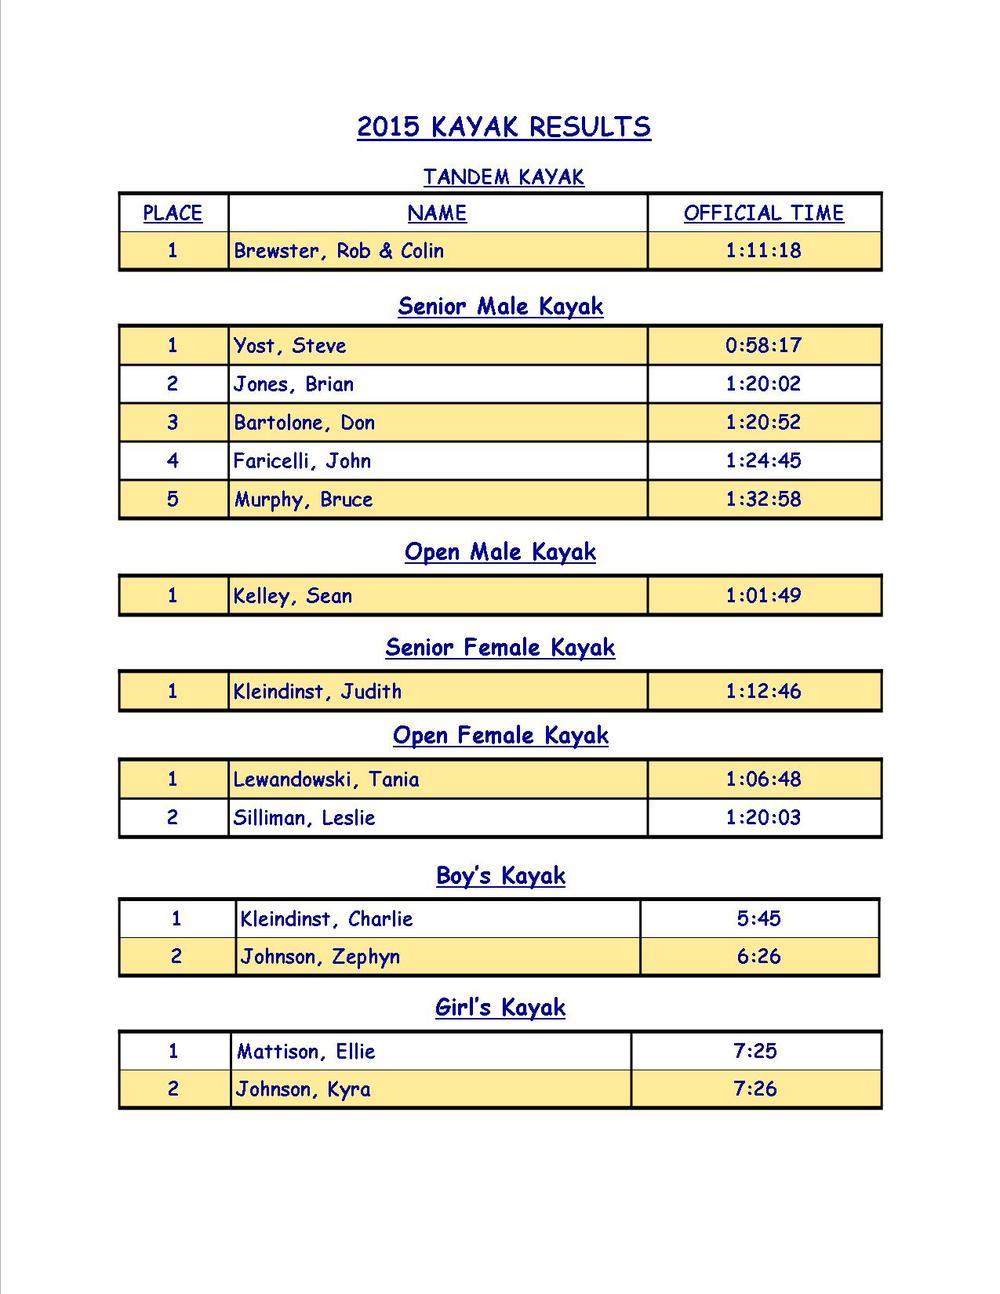 2015 Race Results 4.jpg